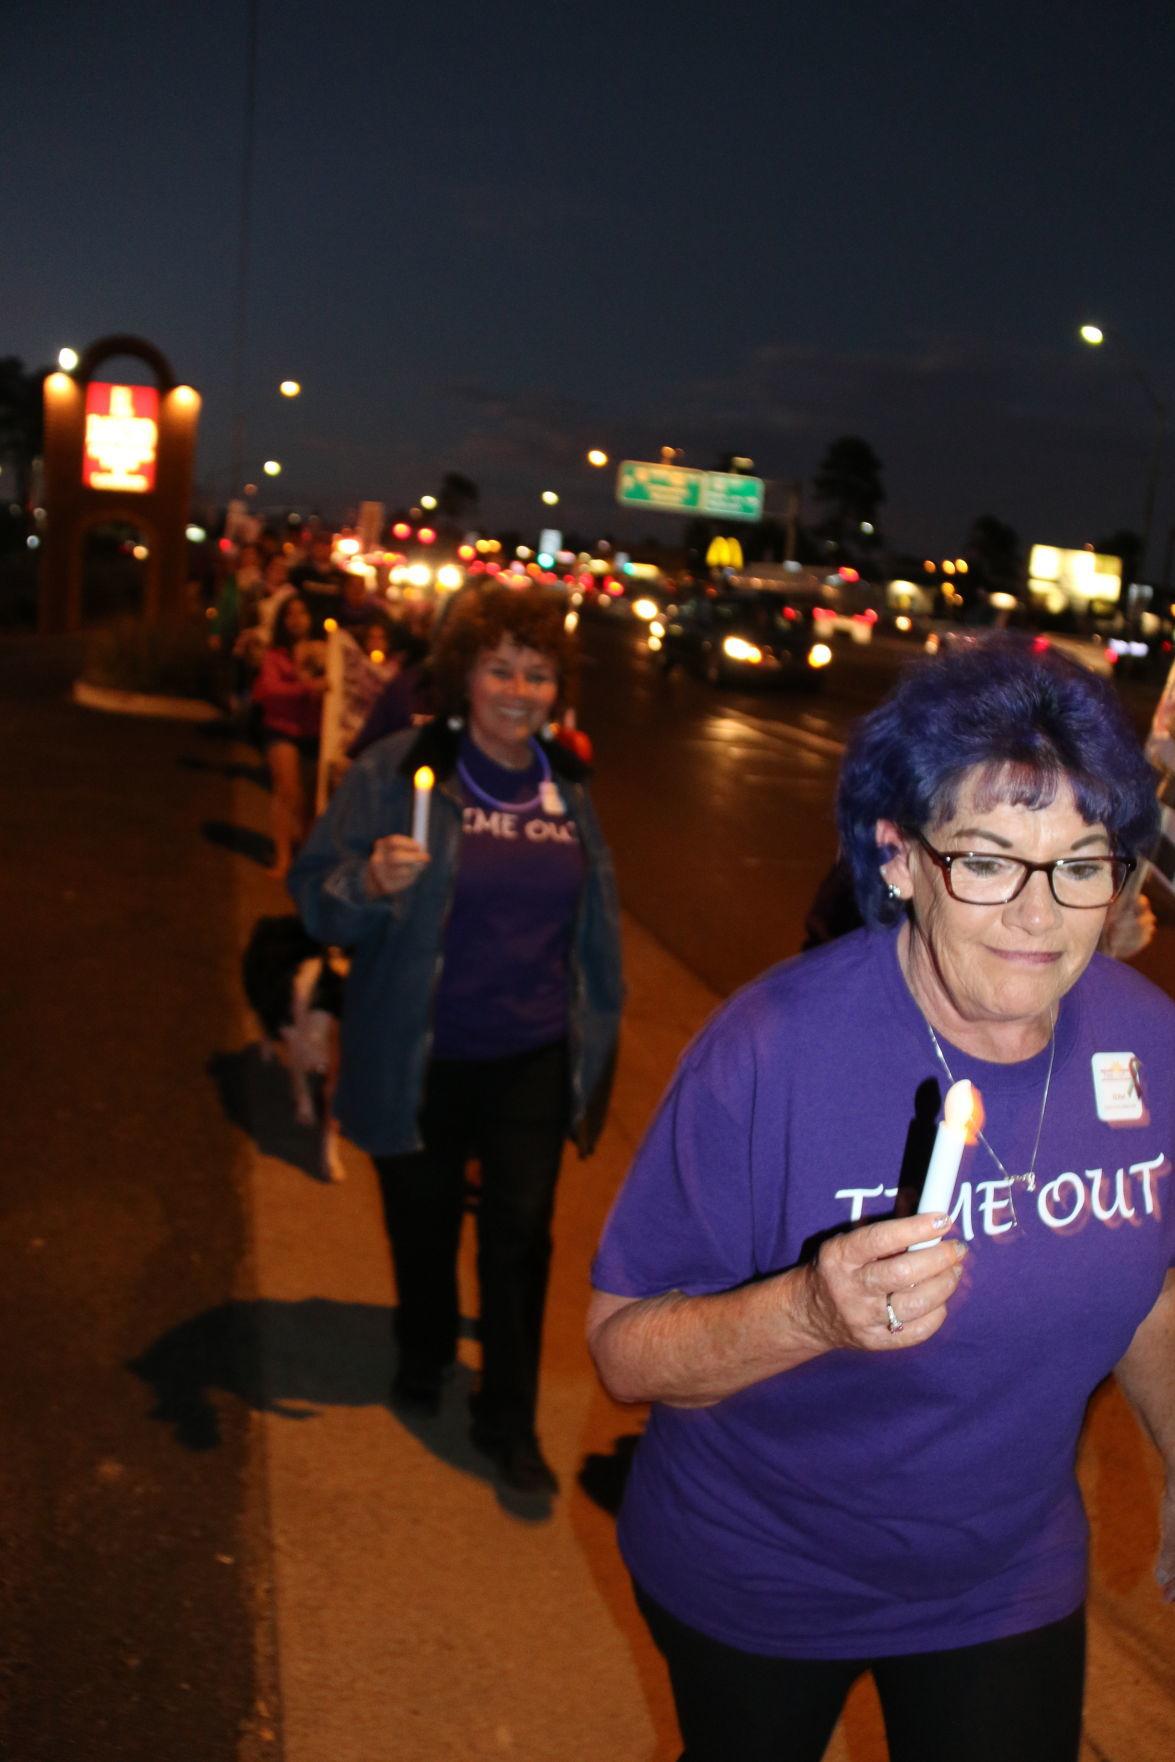 Edna at Domestic Violence March 2017